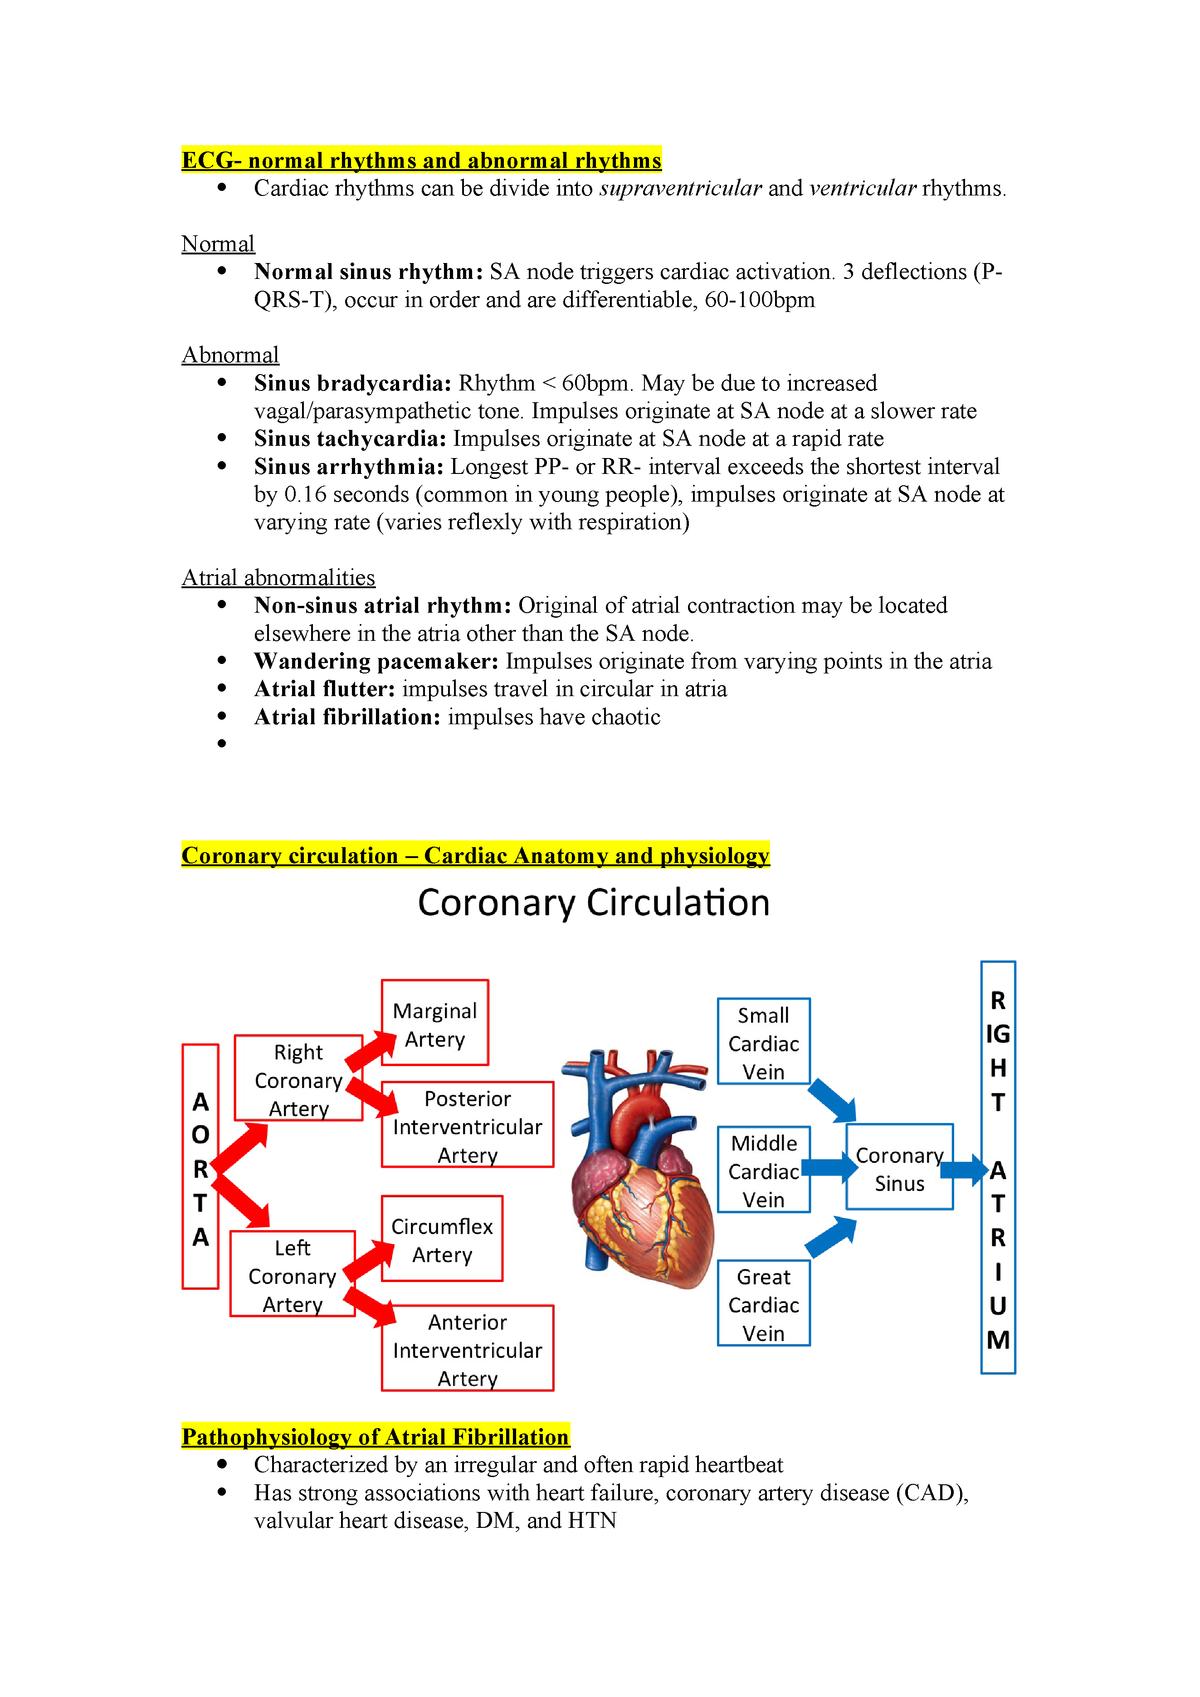 Atrial fibrillation summary notes for Cardiovascular system